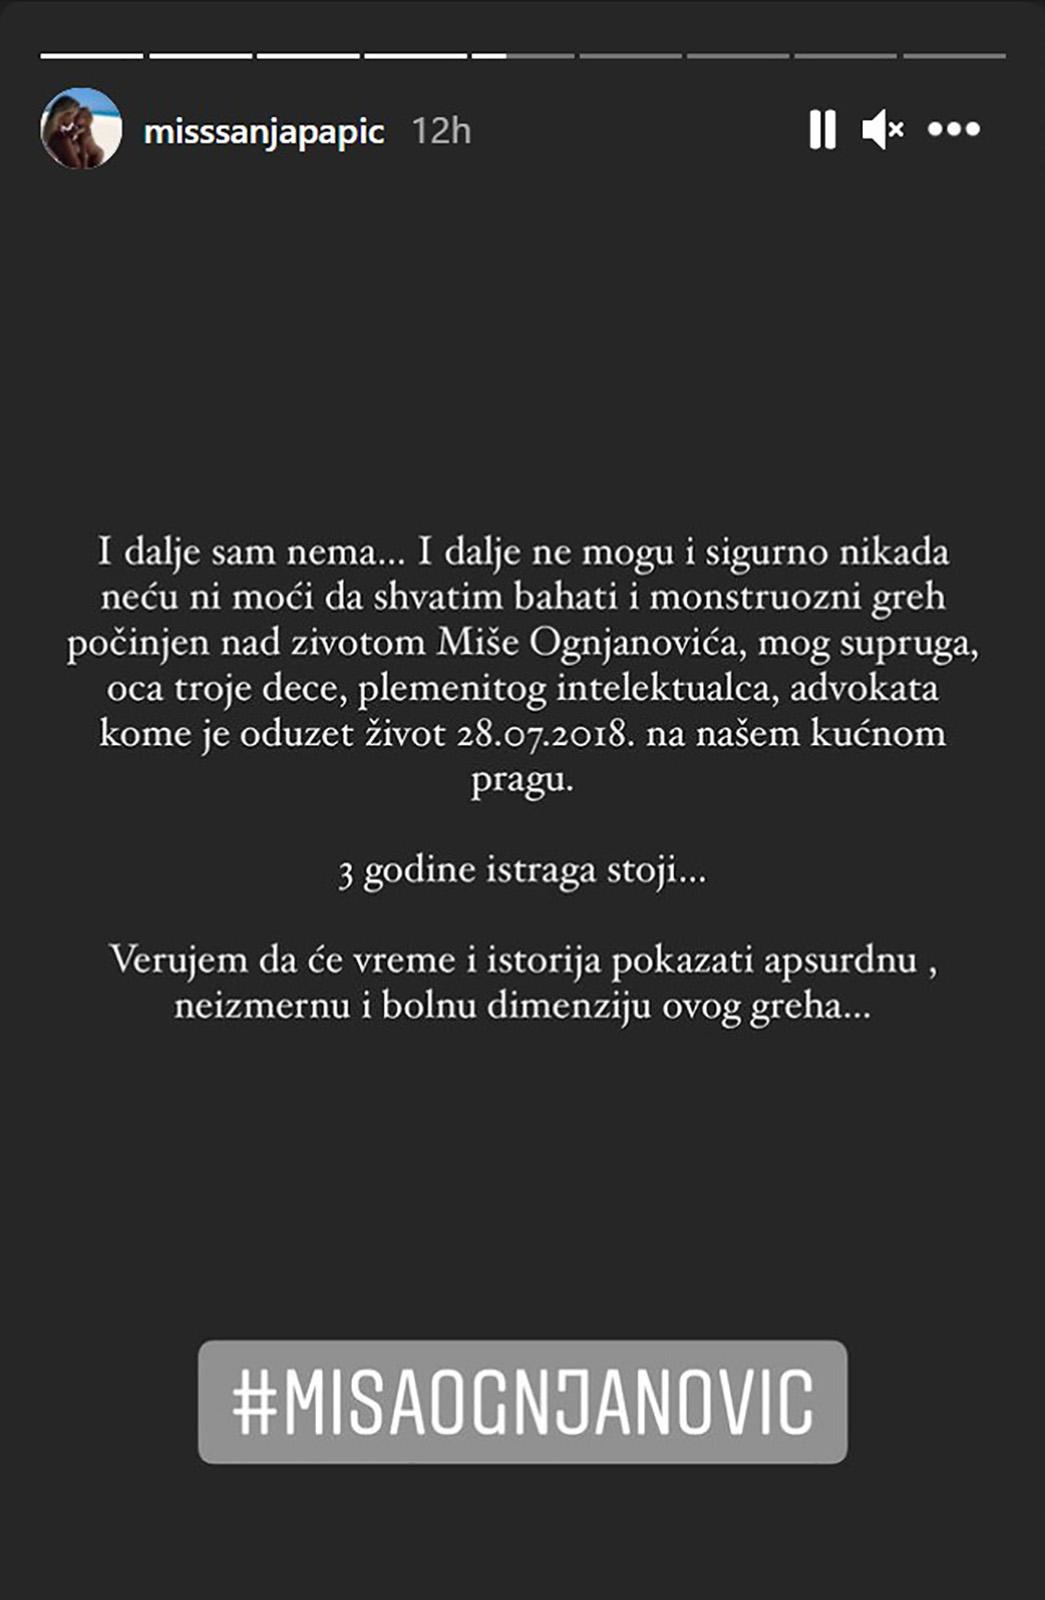 Sanja Papić, Miša Ognjanović